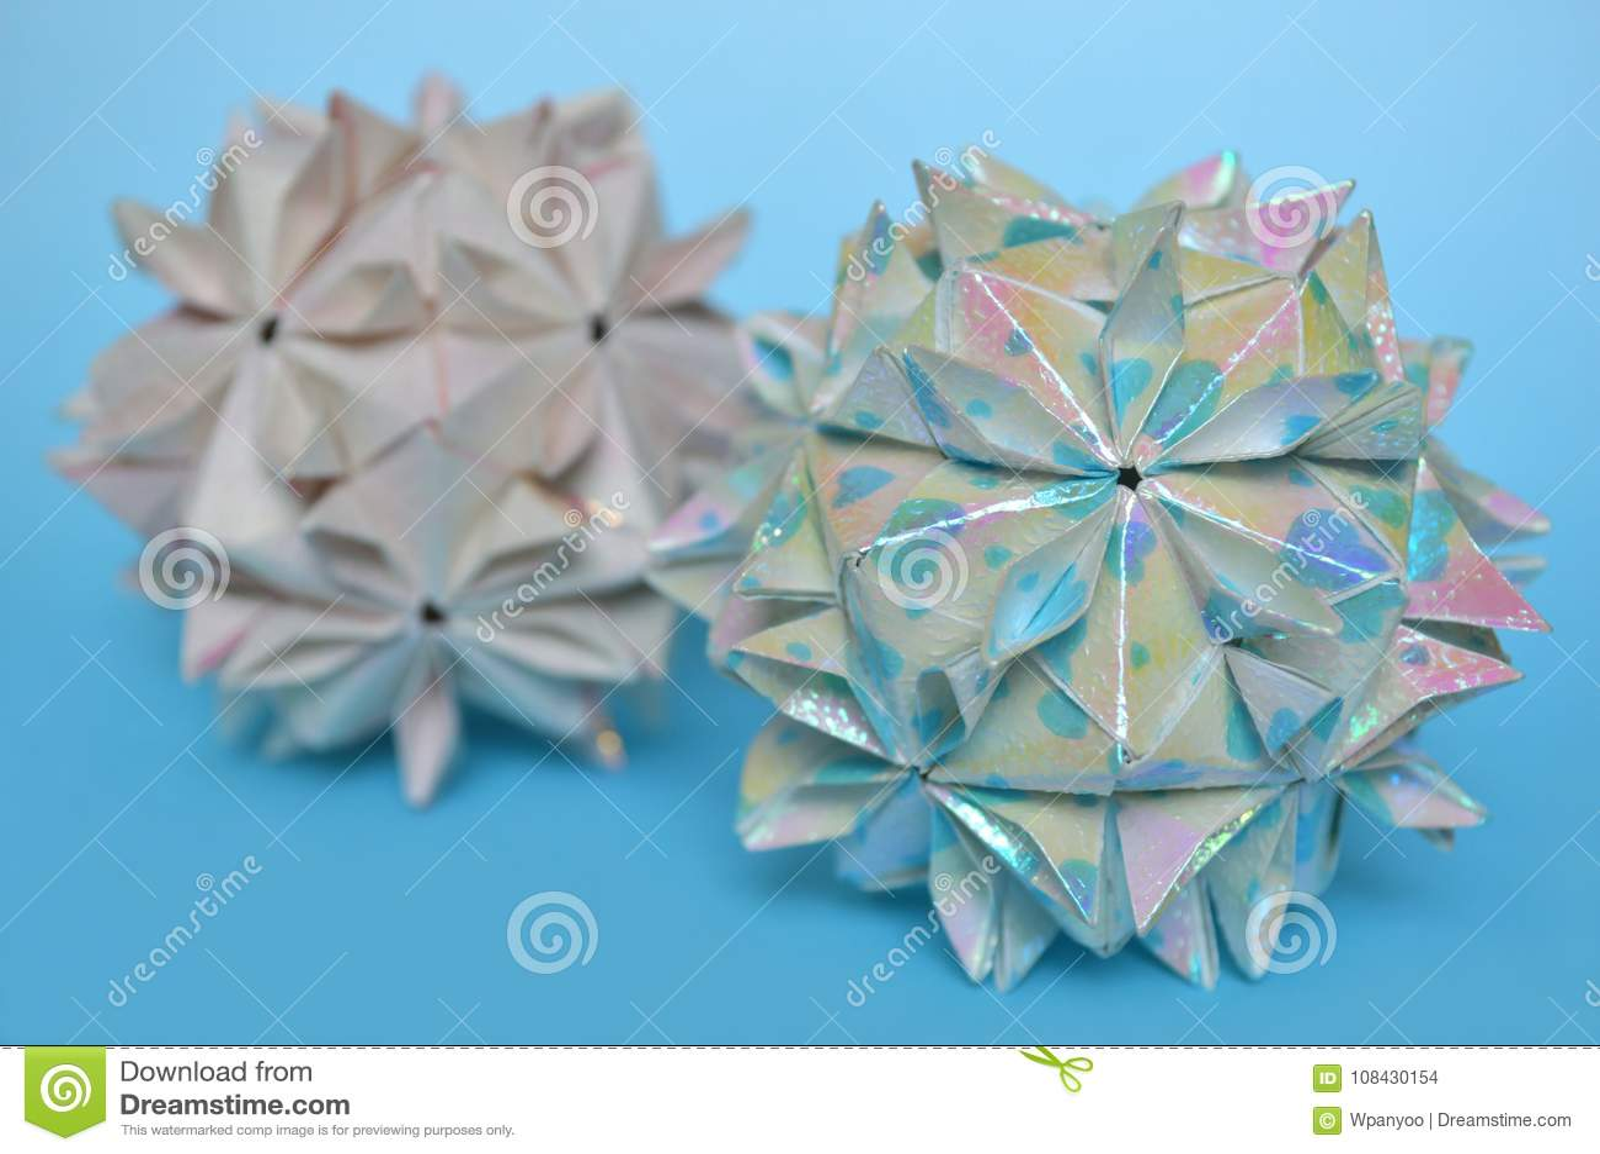 Modular Origami Cherry Blossom Ball Stock Photo Image Of Flower